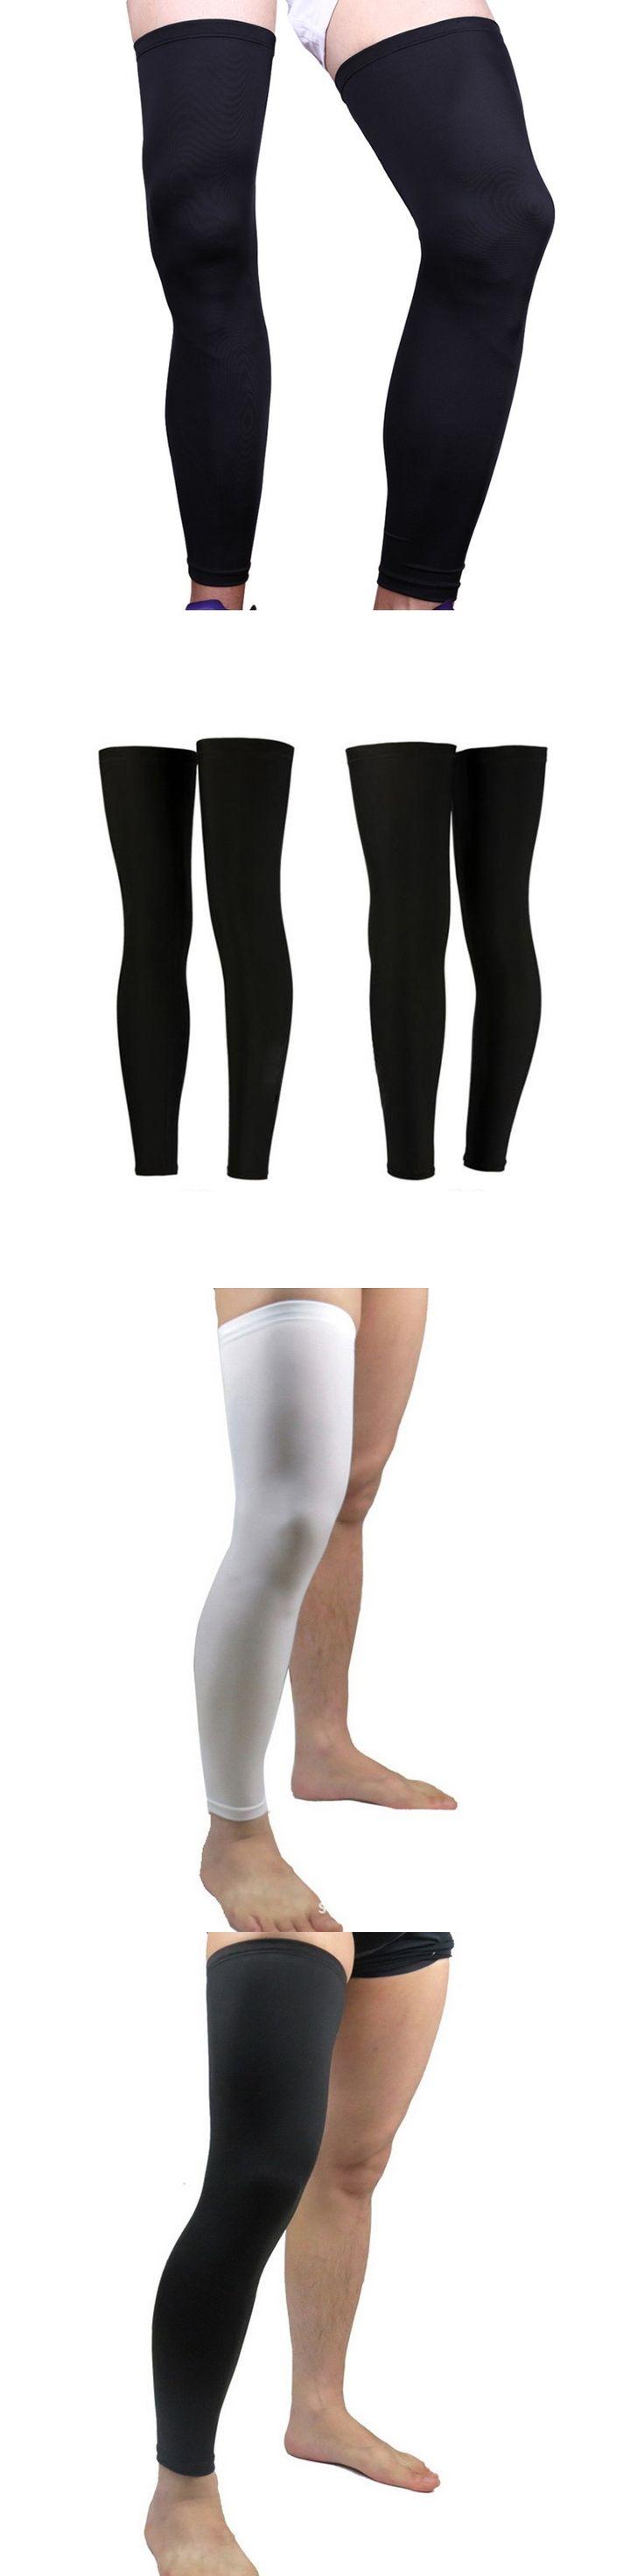 2 pcs/pair super elastic lycra basketball knee pad support  brace football leg calf thigh compression sleeve sports safety